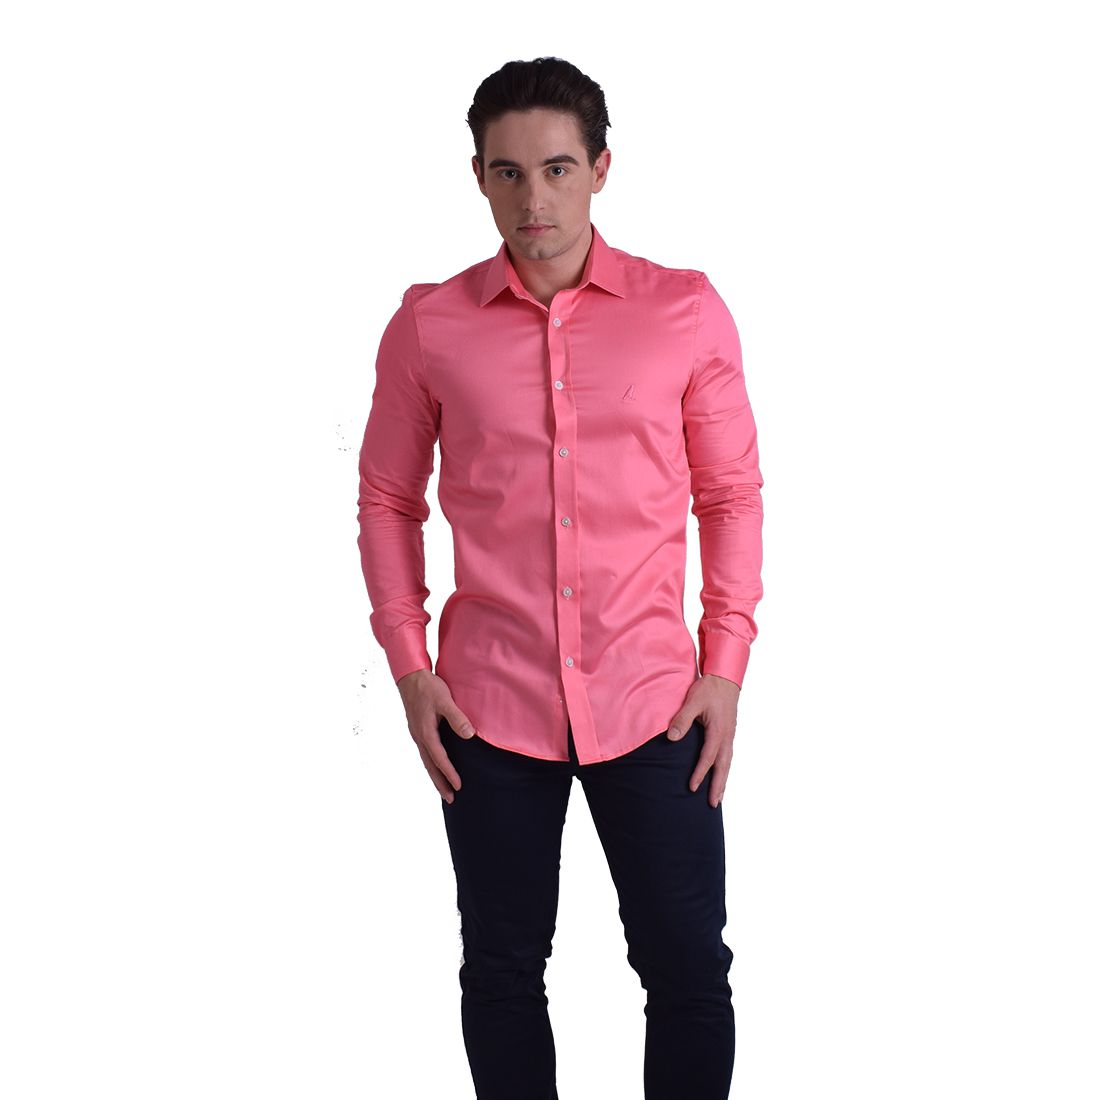 100234 - Camisa Social Masculina Slim Rosa - LEVOK